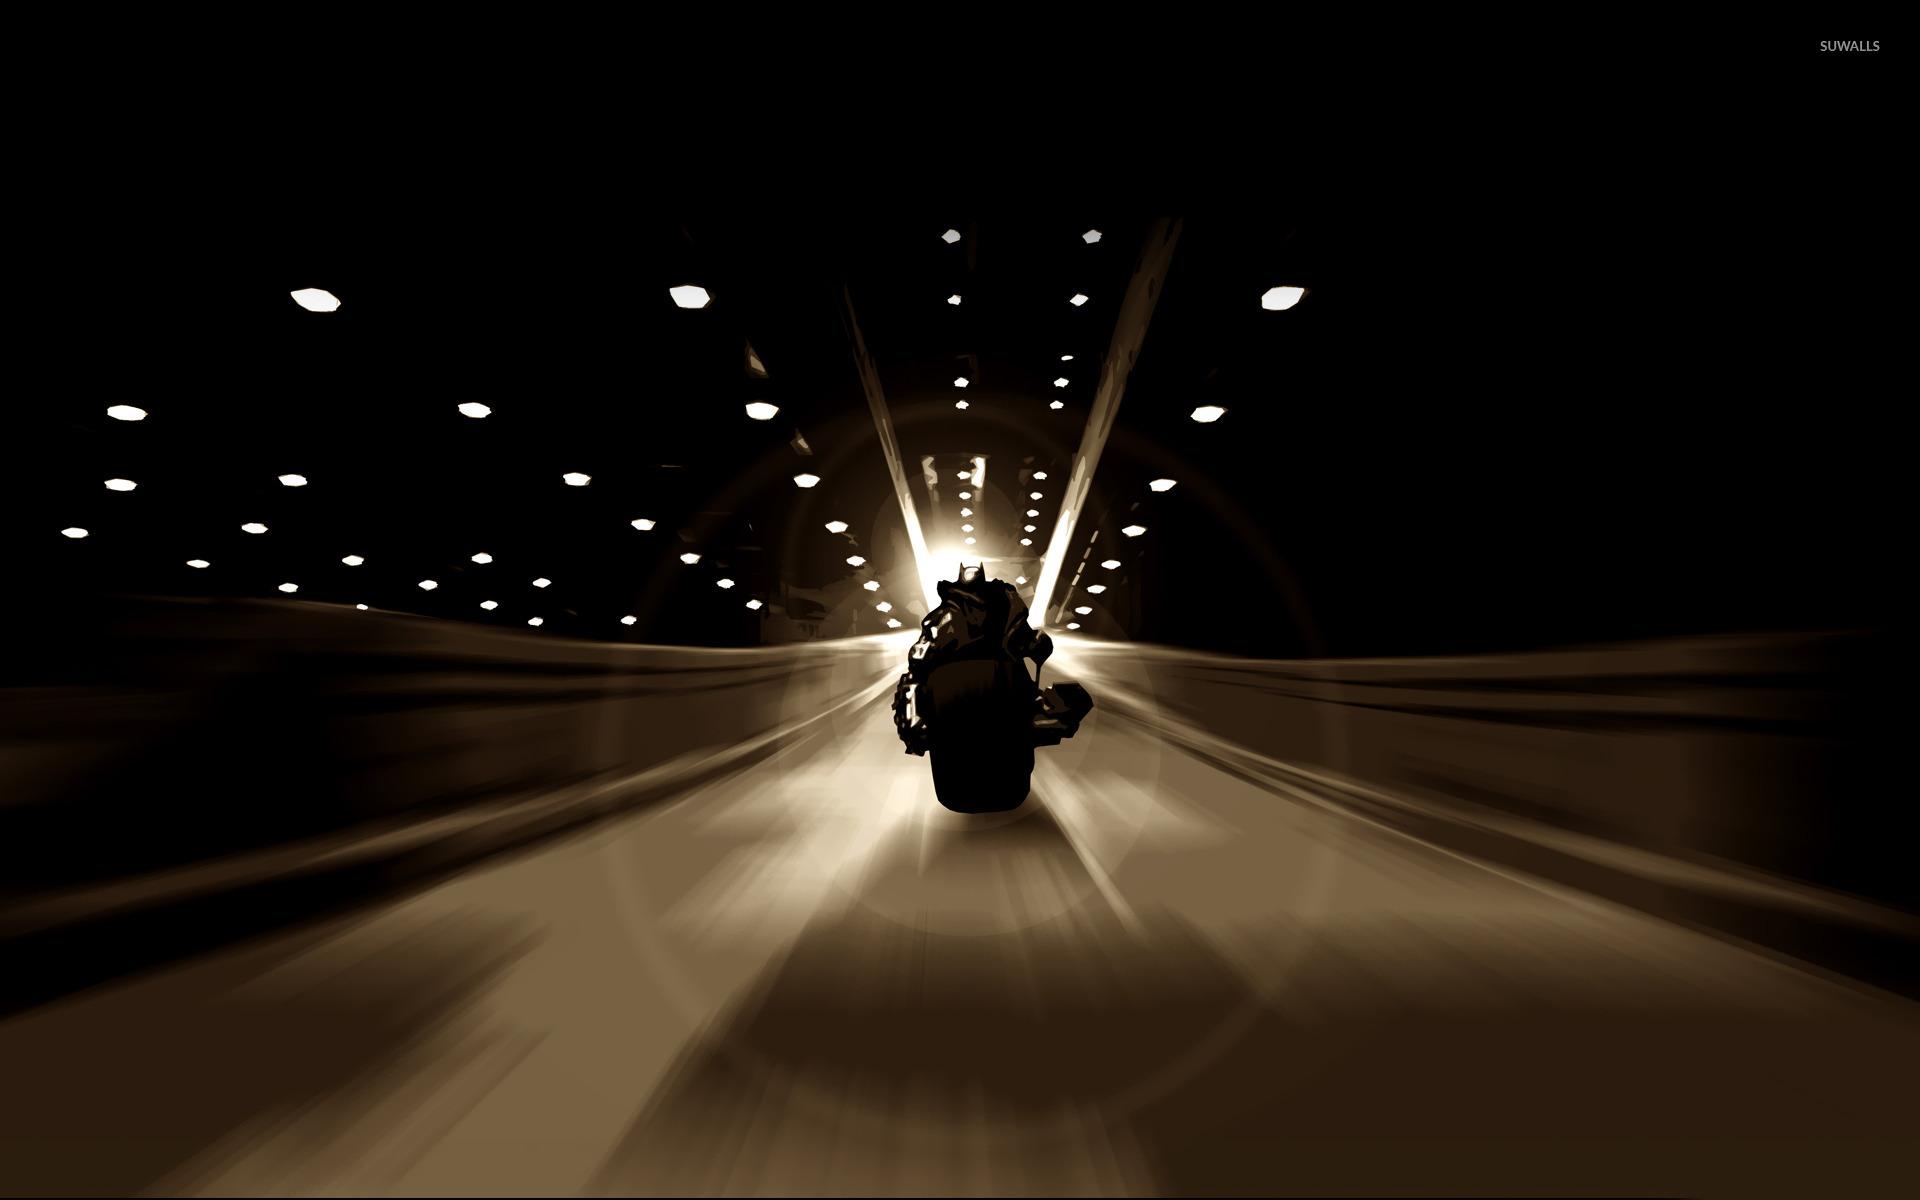 Beautiful Wallpaper Movie Black - batman-14358-1920x1200  Pic_474644.jpg